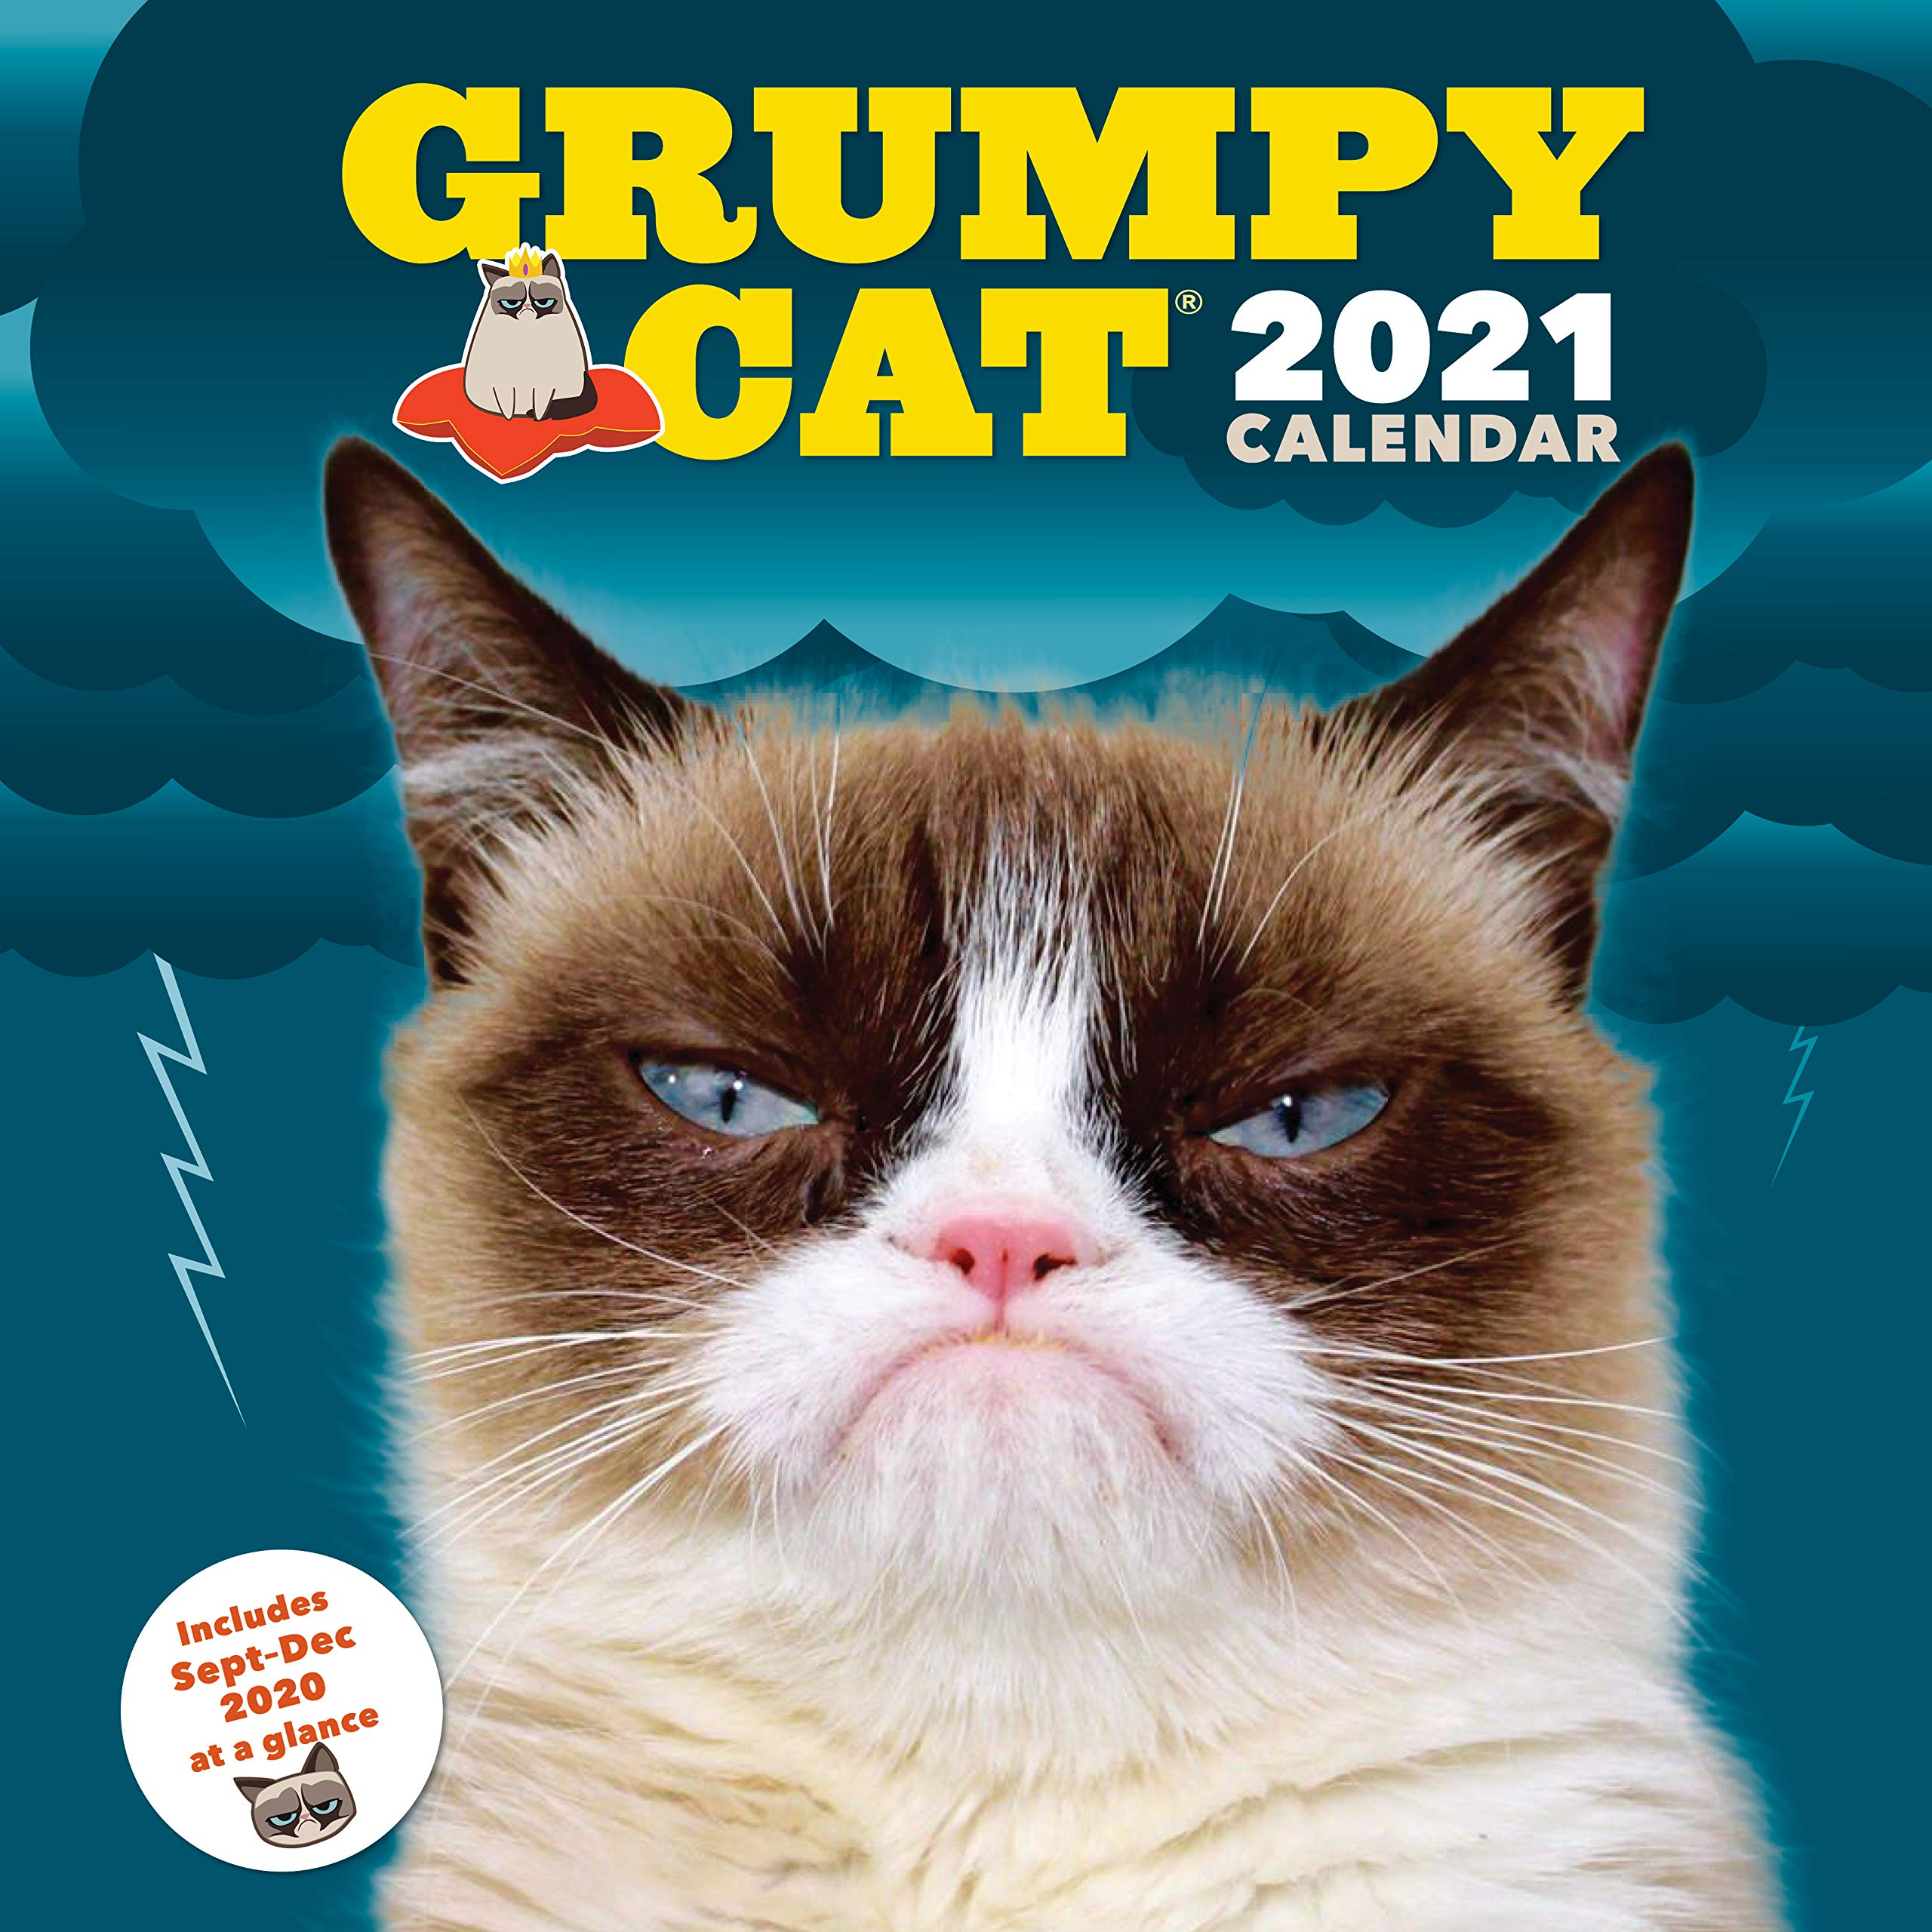 Grumpy Cat Calendar 2022.Grumpy Cat 2021 Wall Calendar Cranky Kitty Monthly Calendar Funny Internet Meme 12 Month Calendar Grumpy Cat 9781452177359 Amazon Com Books